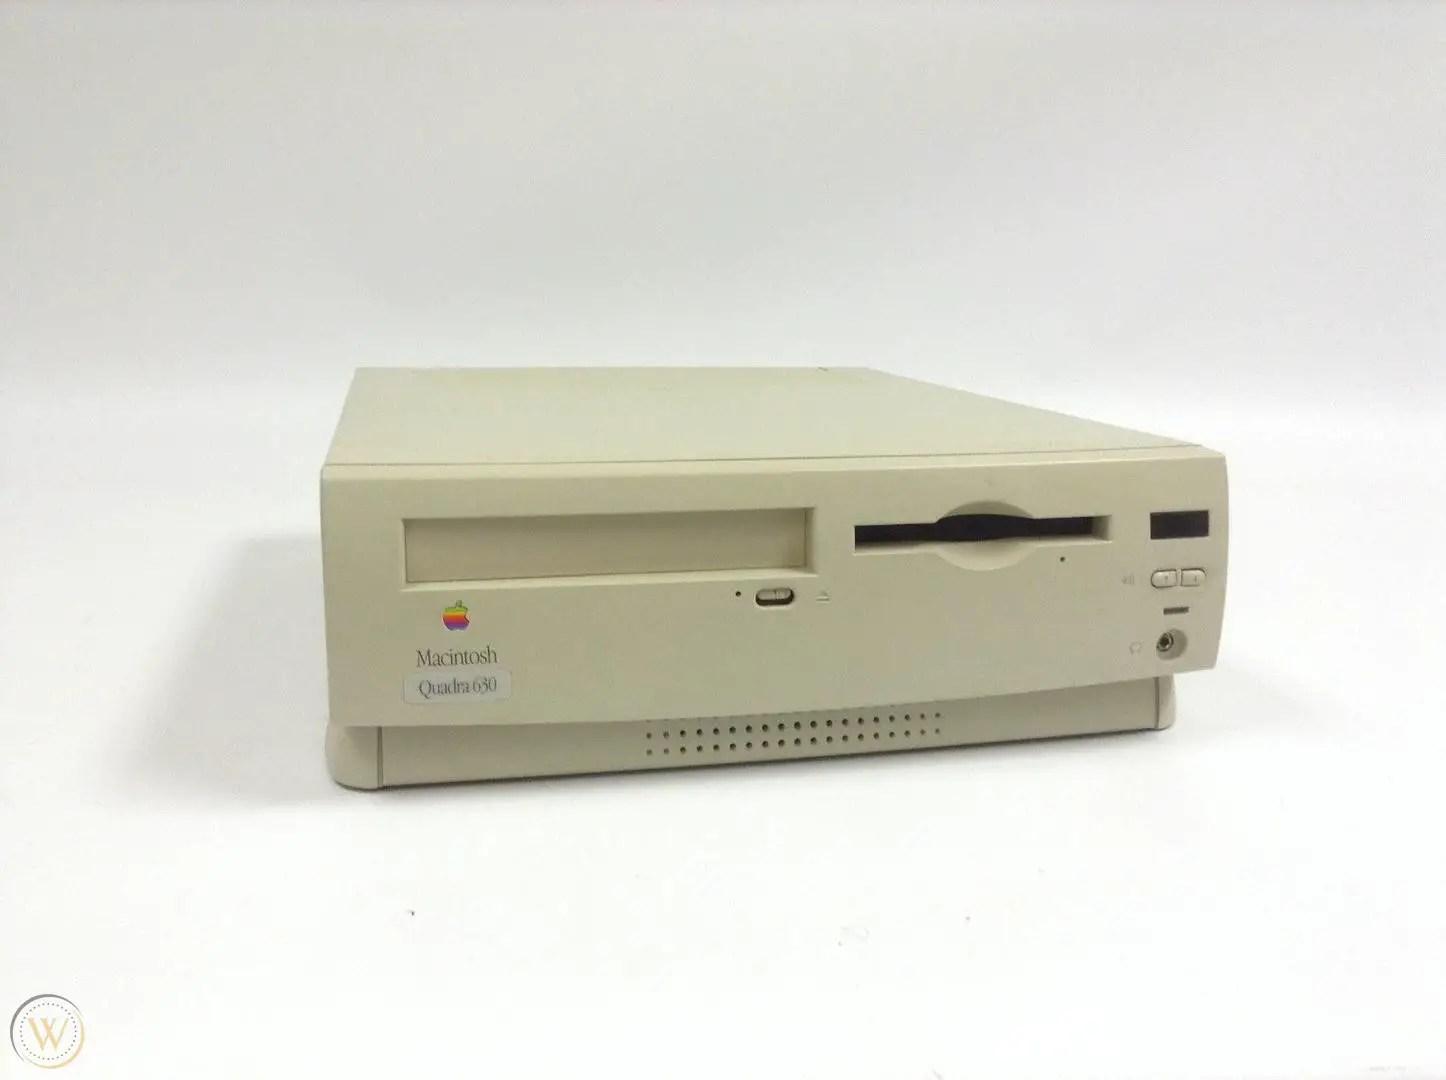 Macintosh Quadra 630